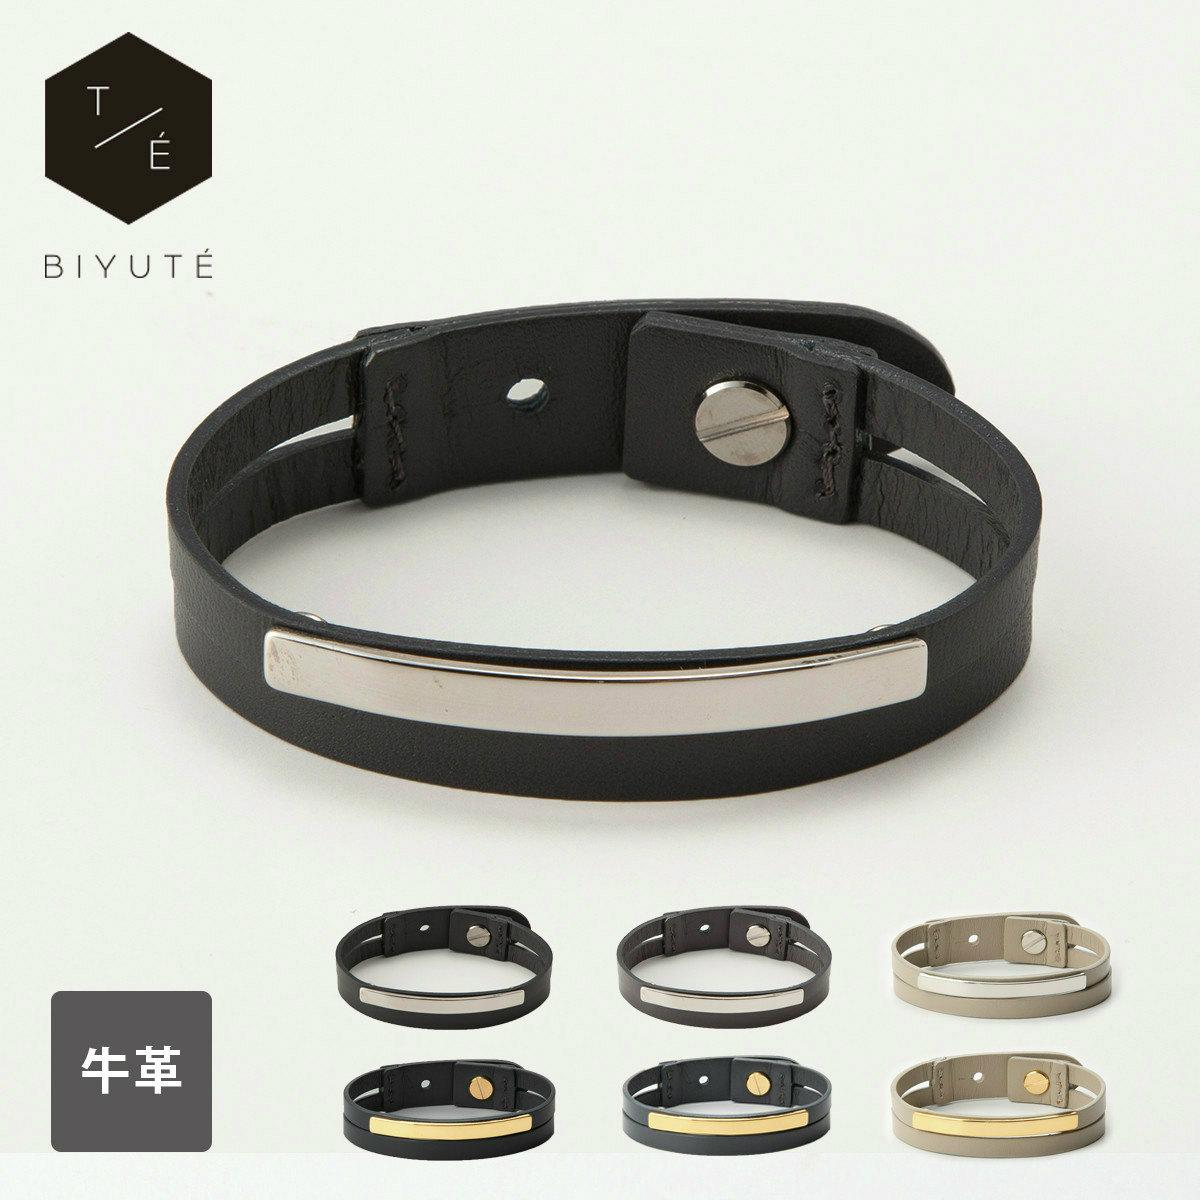 BIYUTE ハンドアクセサリー レザーバングル アームカフ シンプル細ベルト 全6色